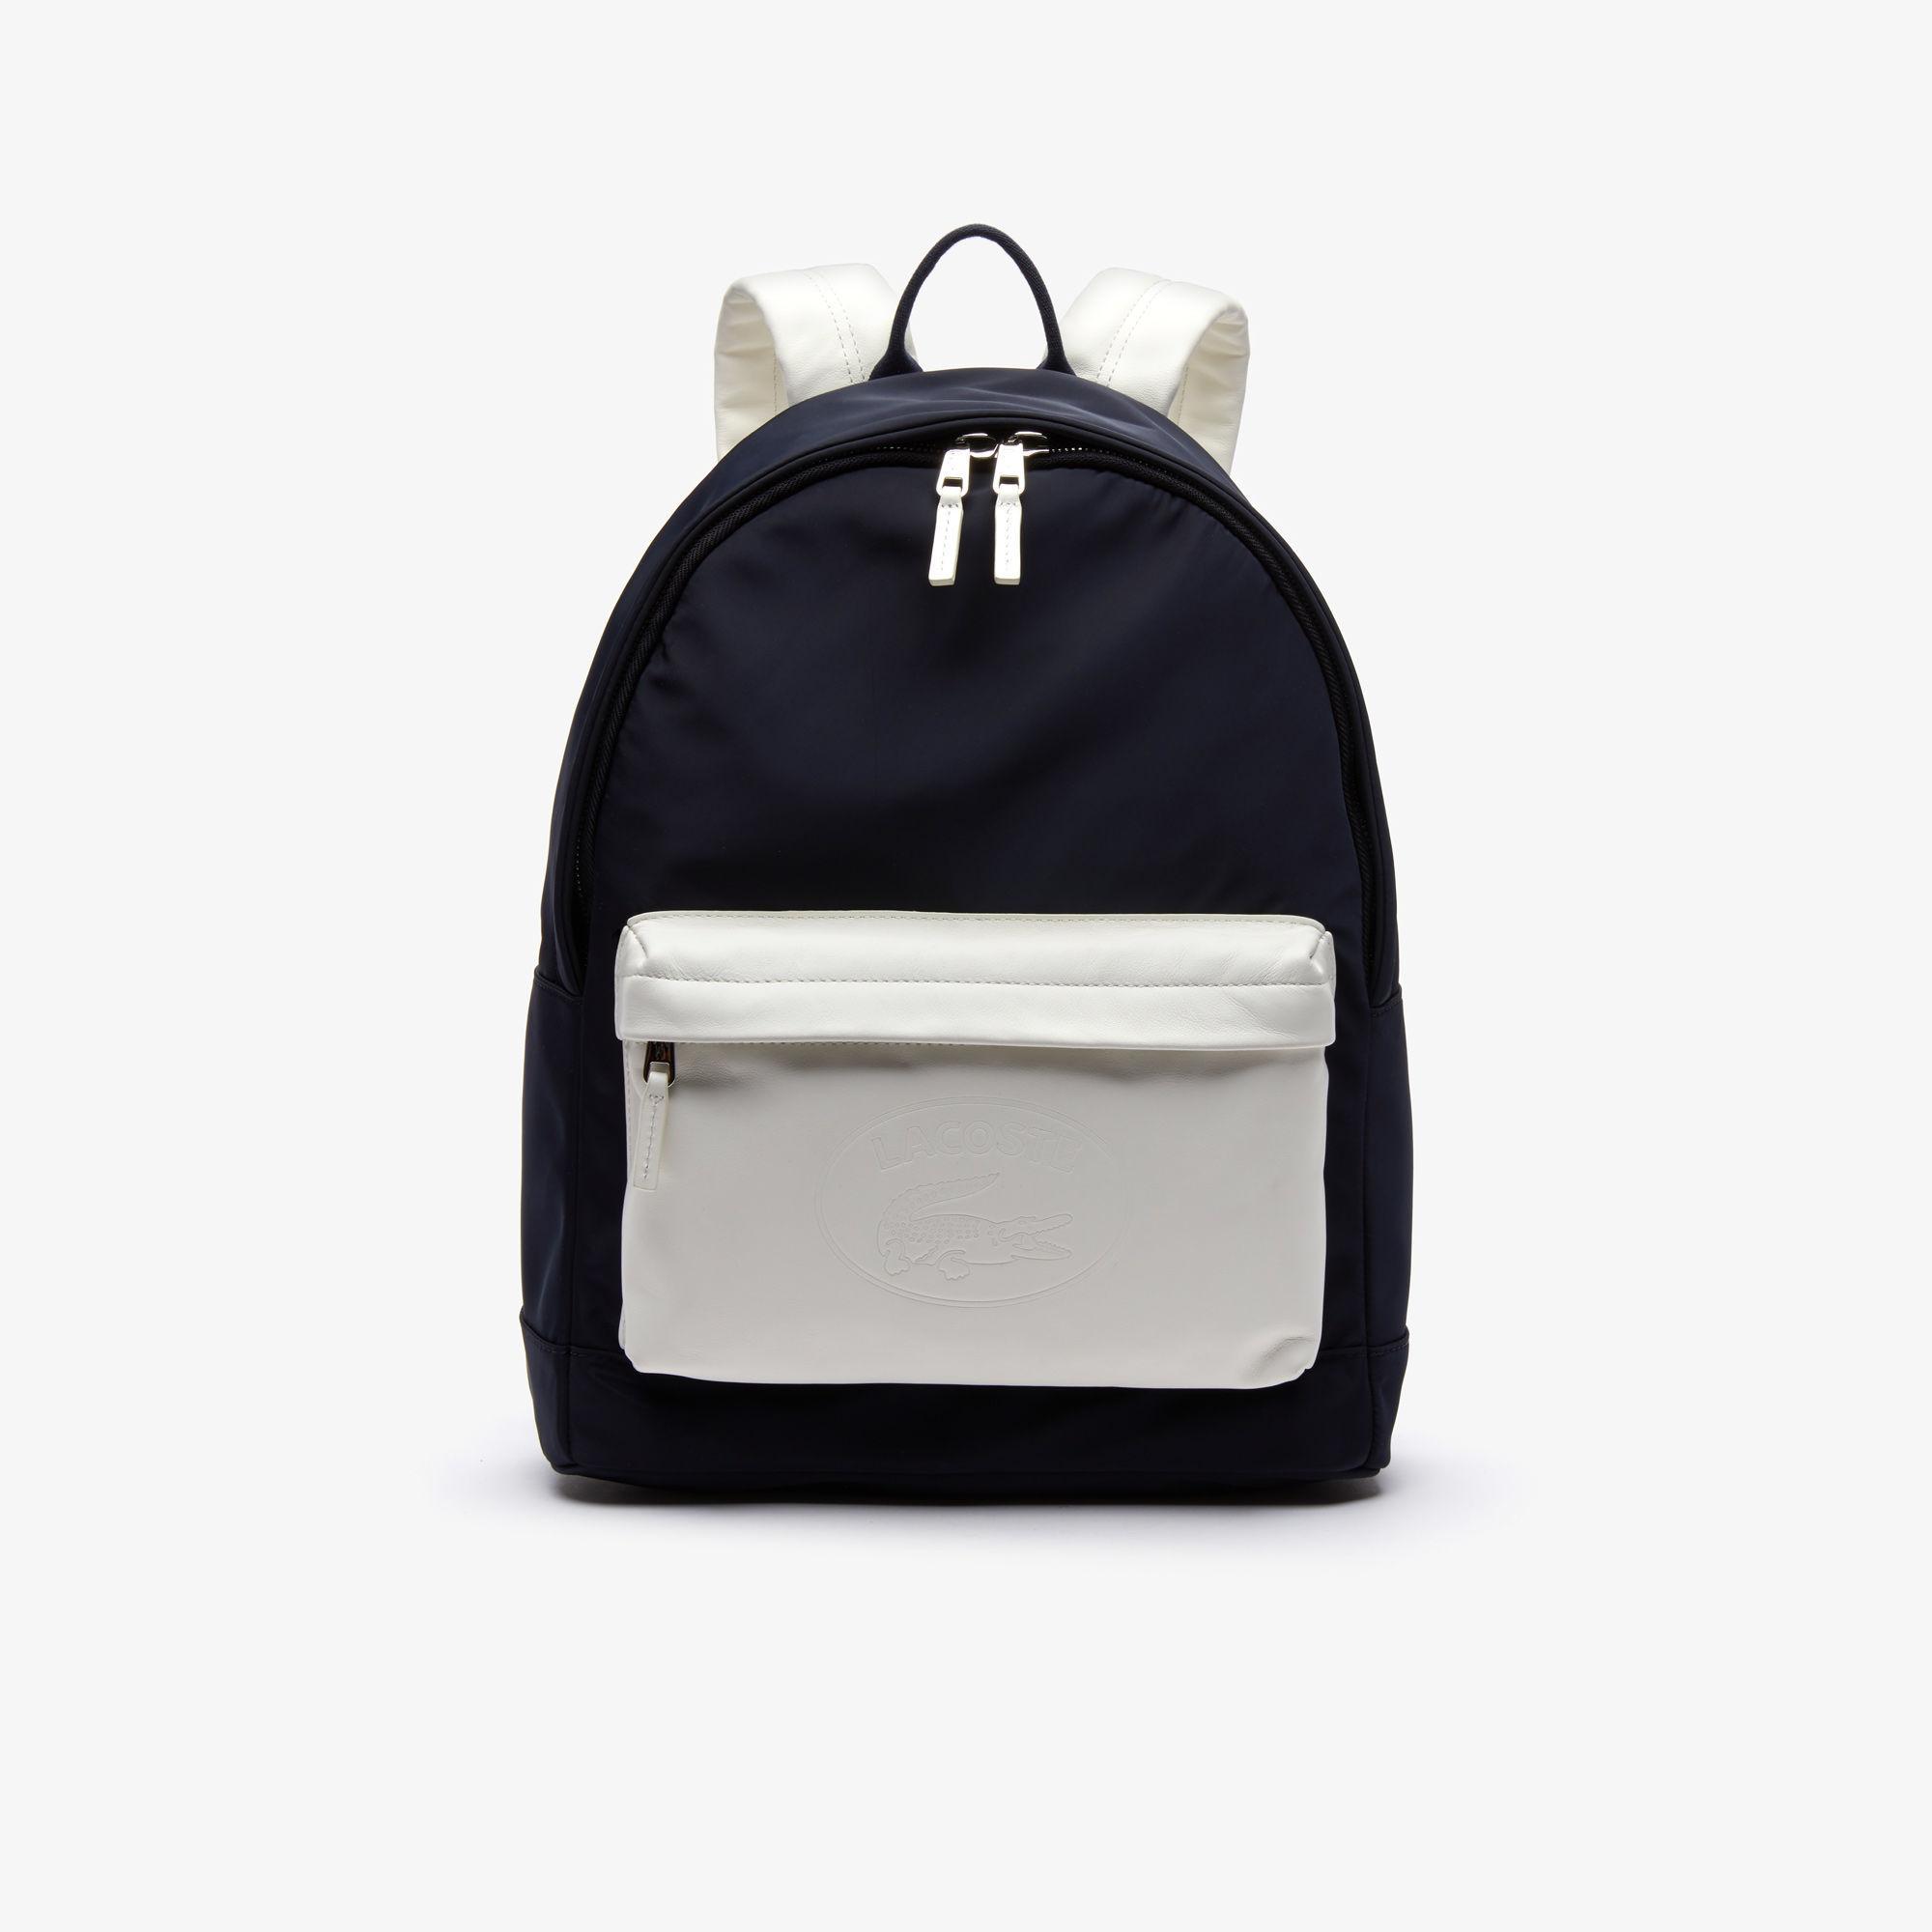 6cae09d14964 ... L.12.12 Embossed Lettering Bicolour Leather Backpack for Men - Lyst.  View fullscreen